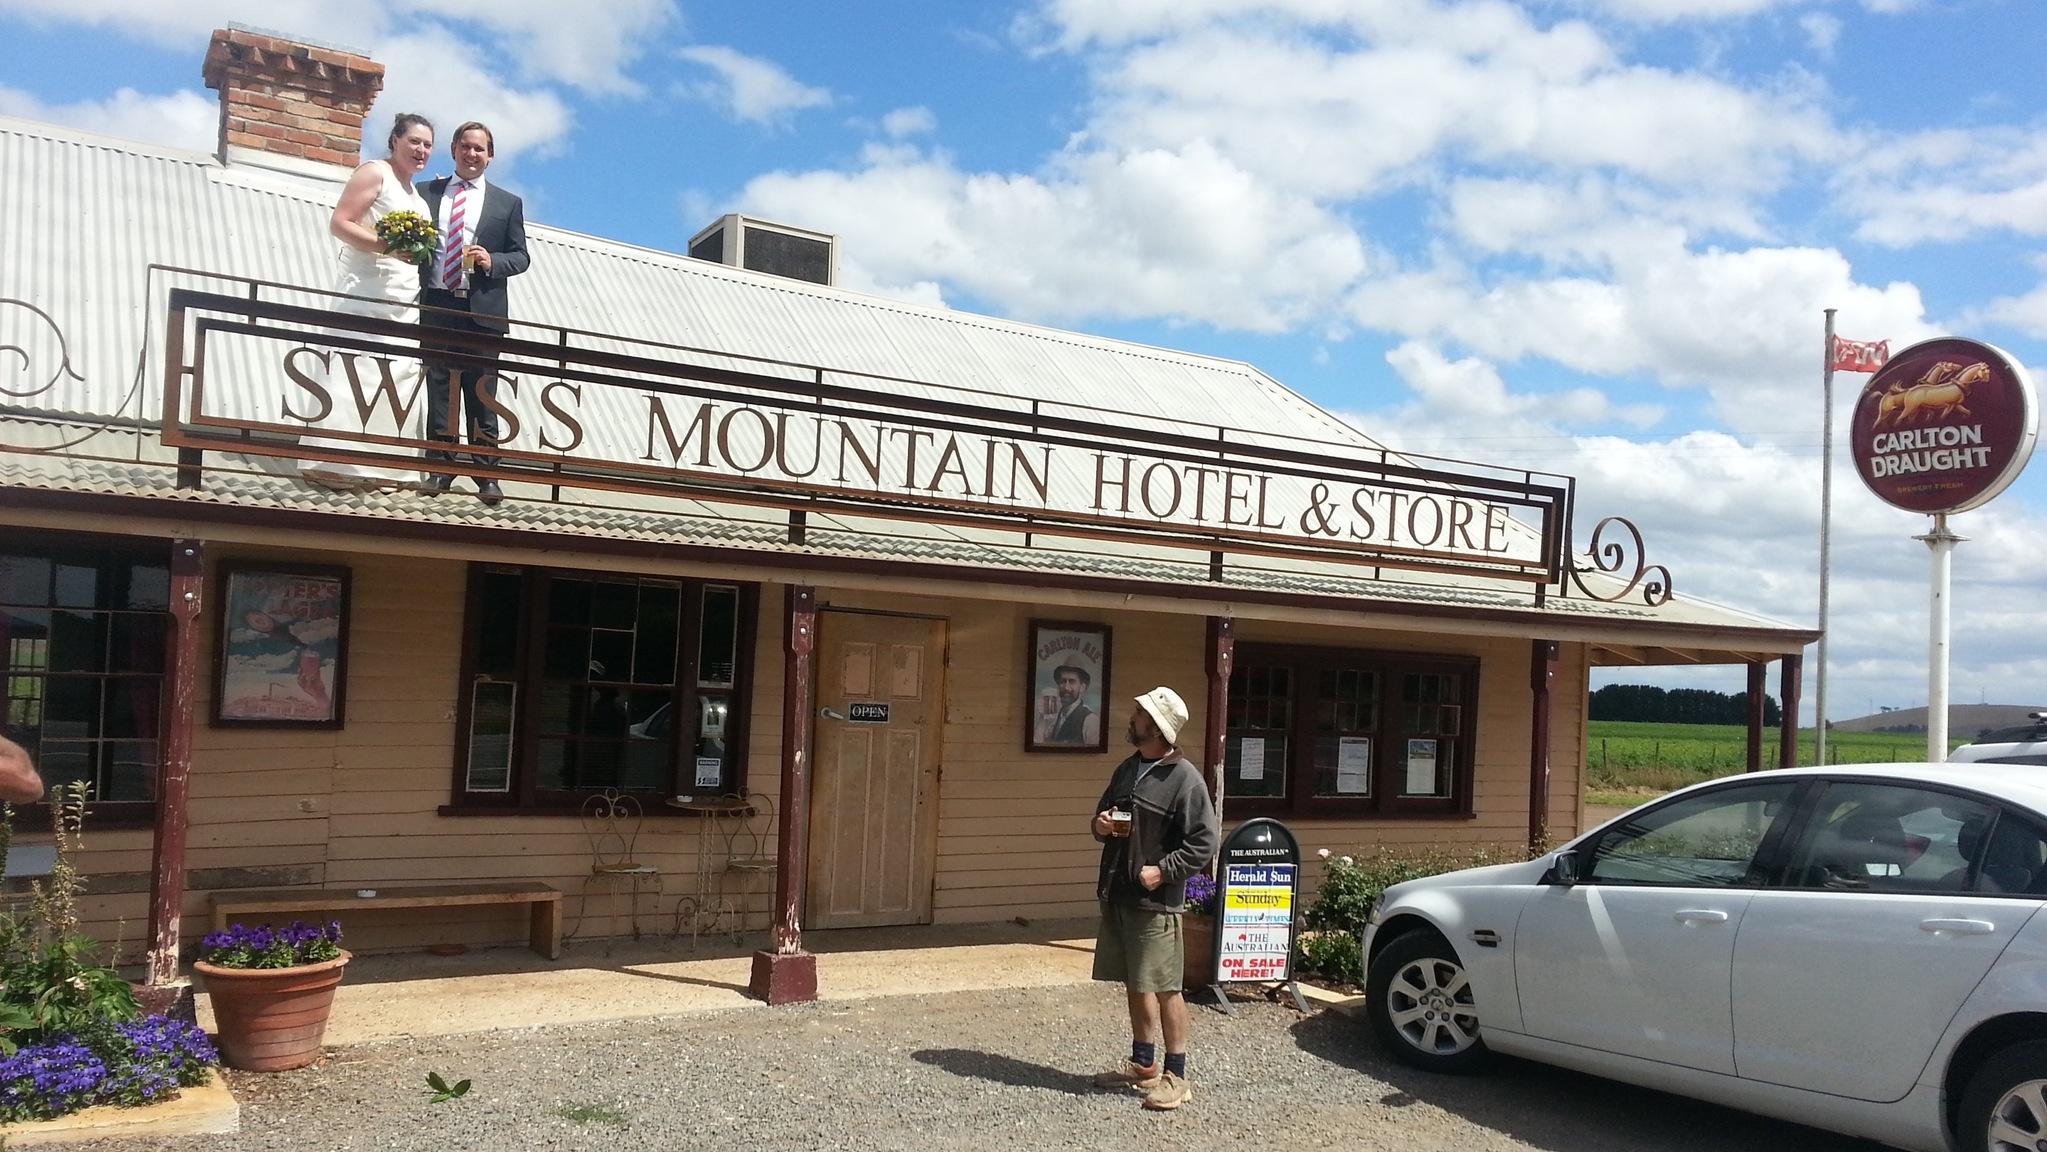 Swiss Mountain Hotel